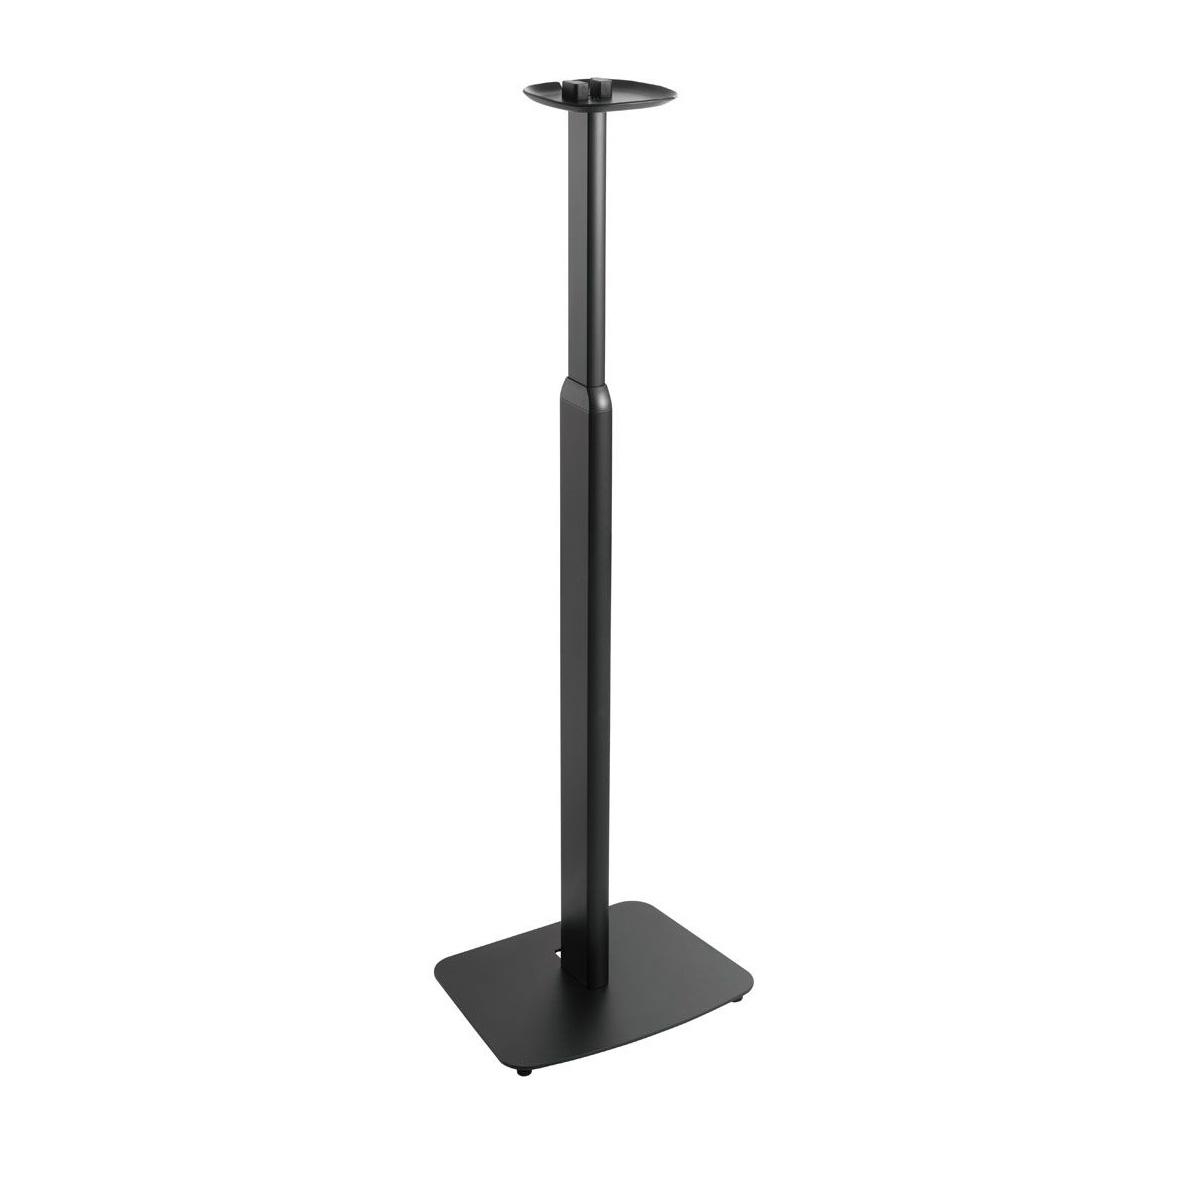 S1-FLR2 Black SONOS Speaker Stand